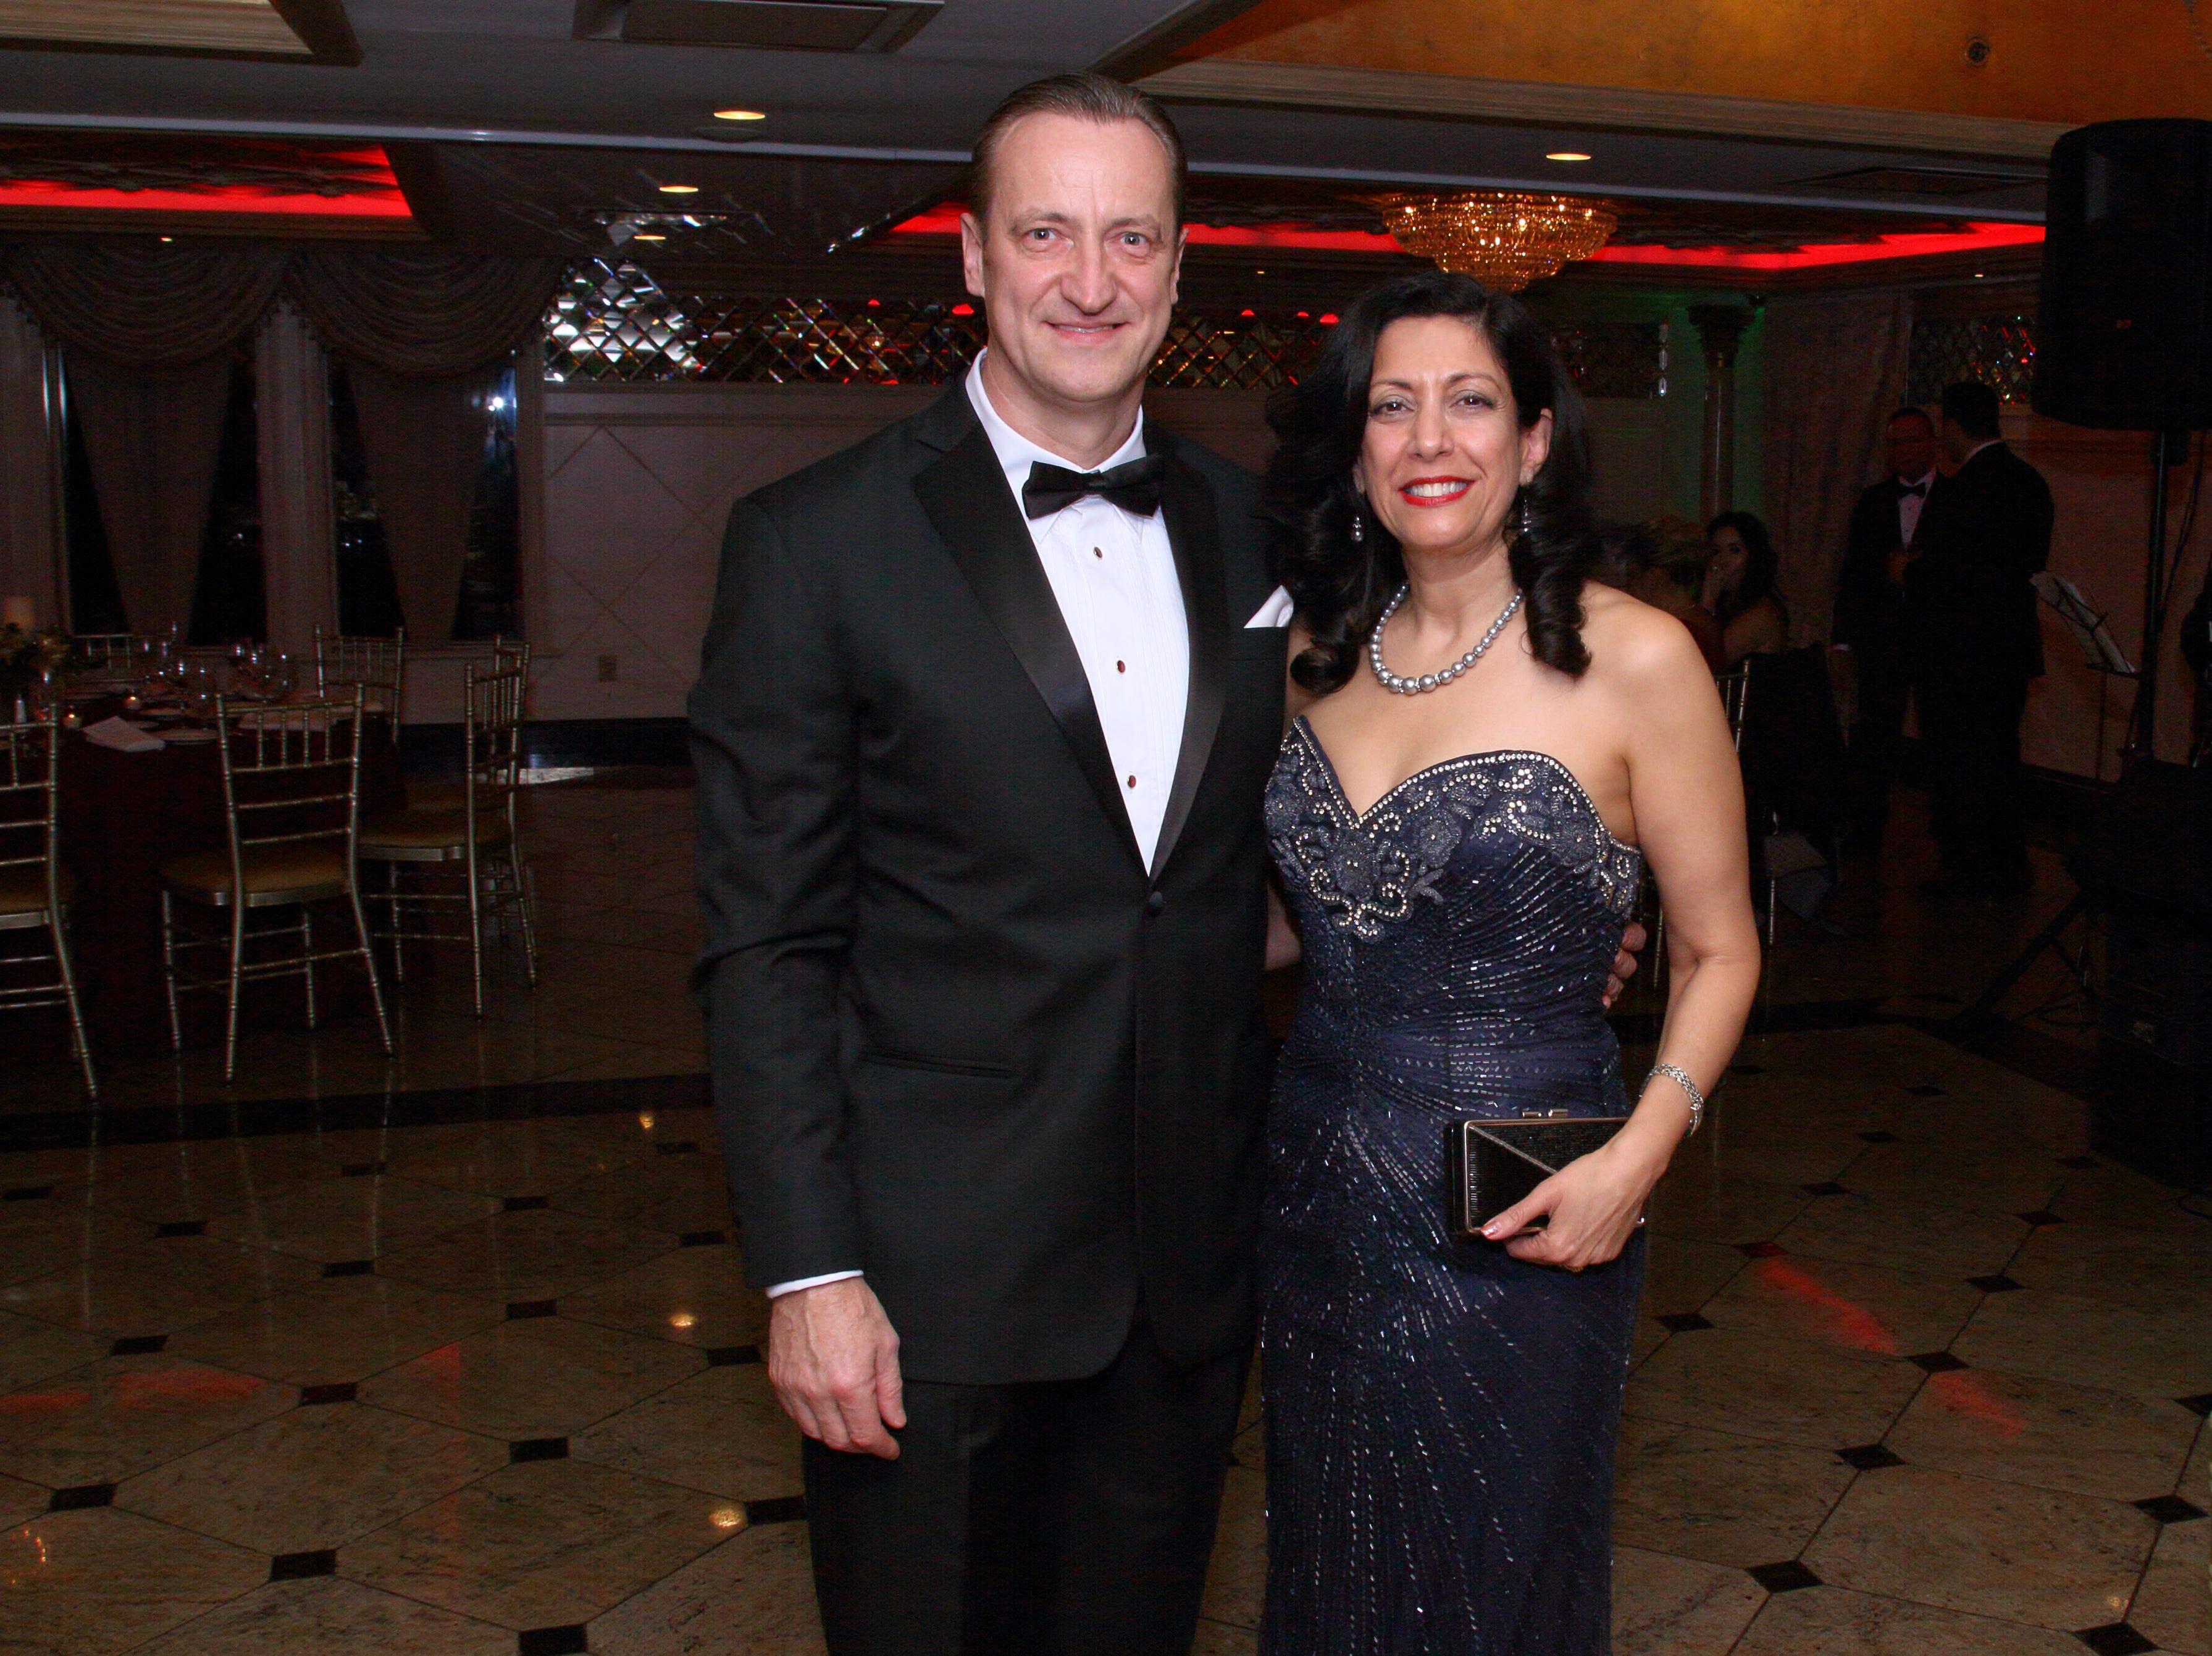 Mark and Helena Zagorski. The Saddle River Valley Club held its annual Holiday Gala celebration at Seasons in Washington Township. 11/30/2018